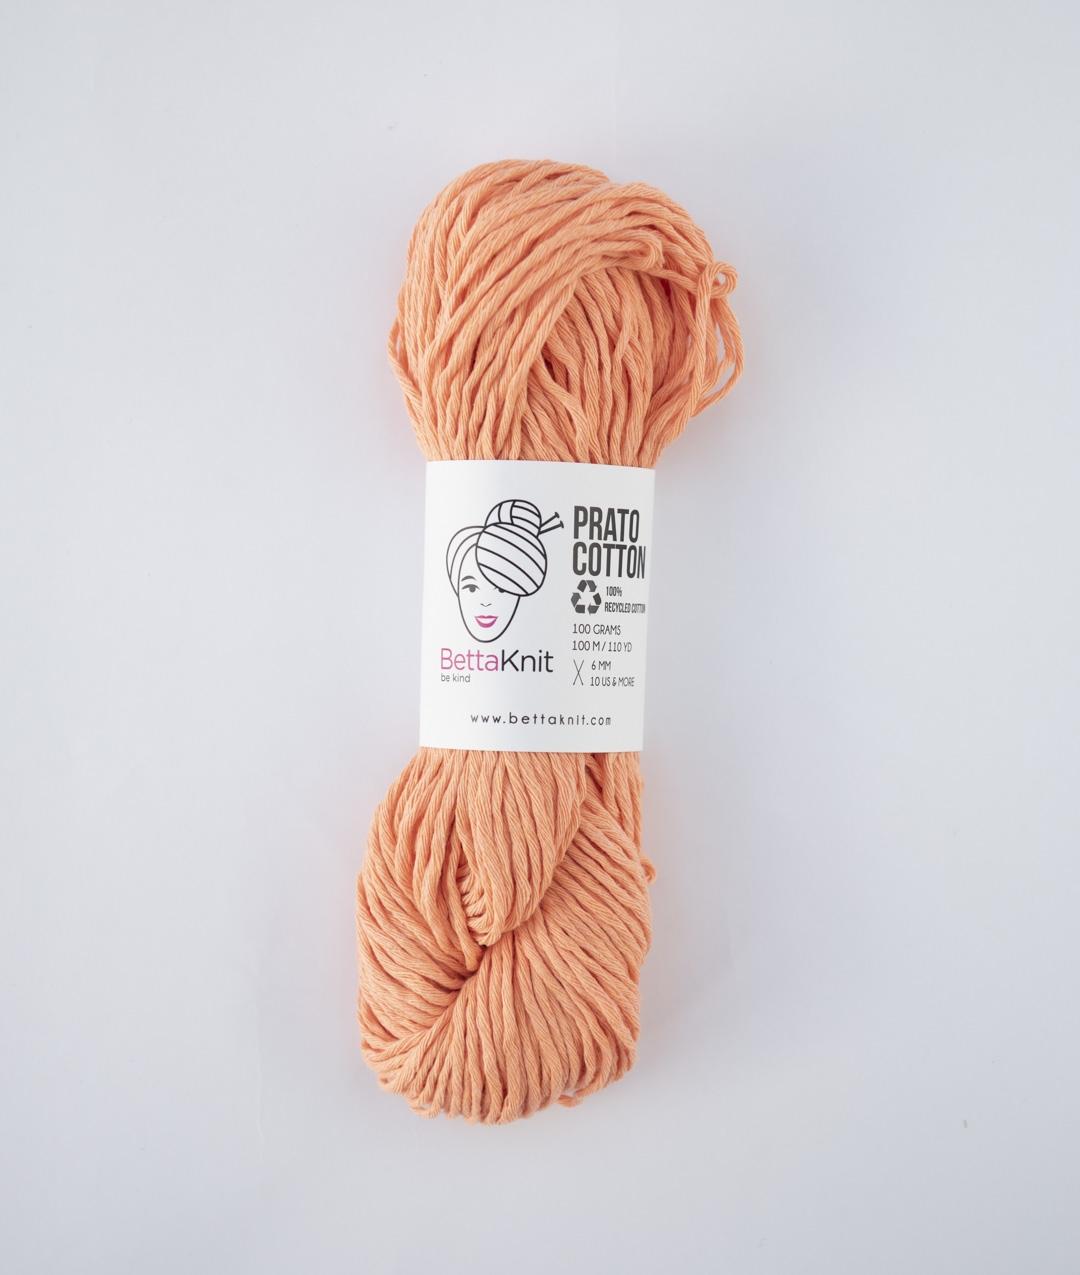 Cotton -  - Prato Cotton - 1